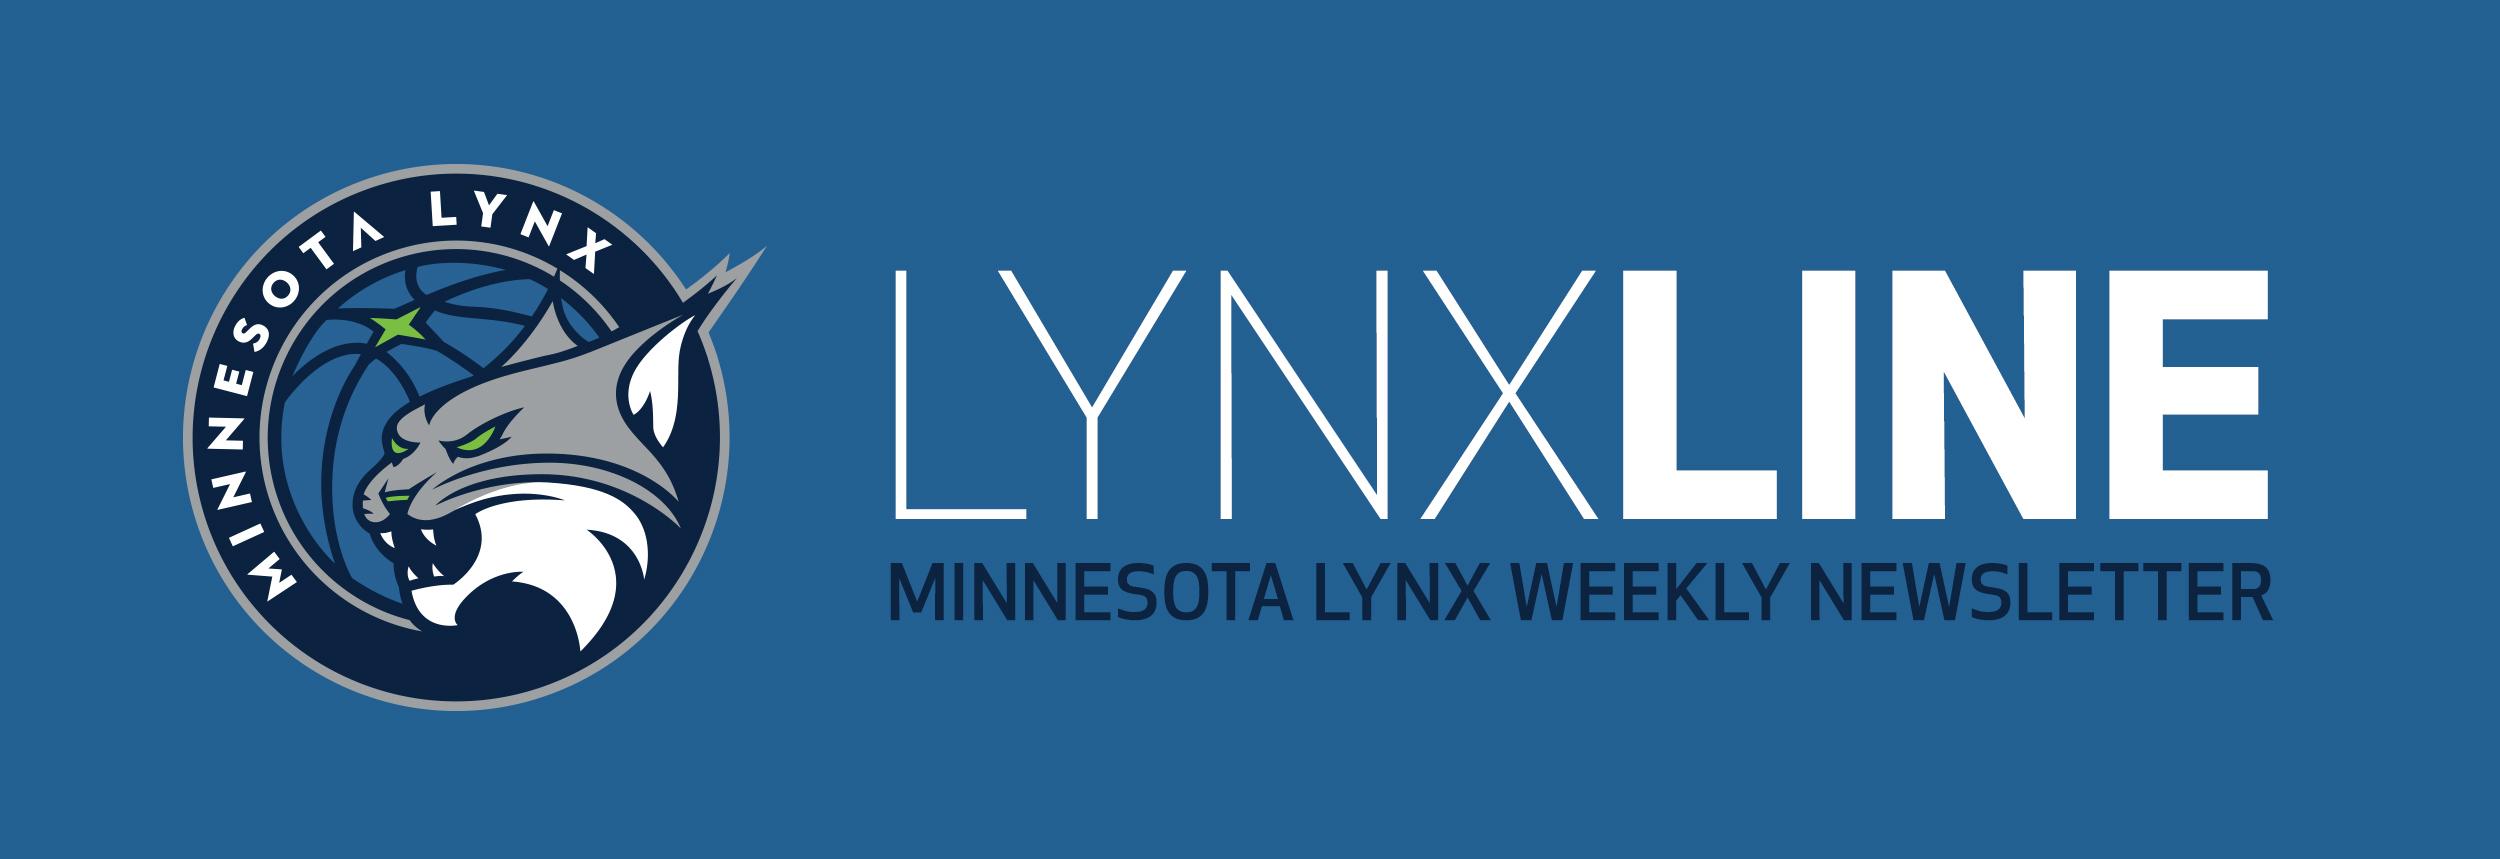 Sign Up For LynxLine